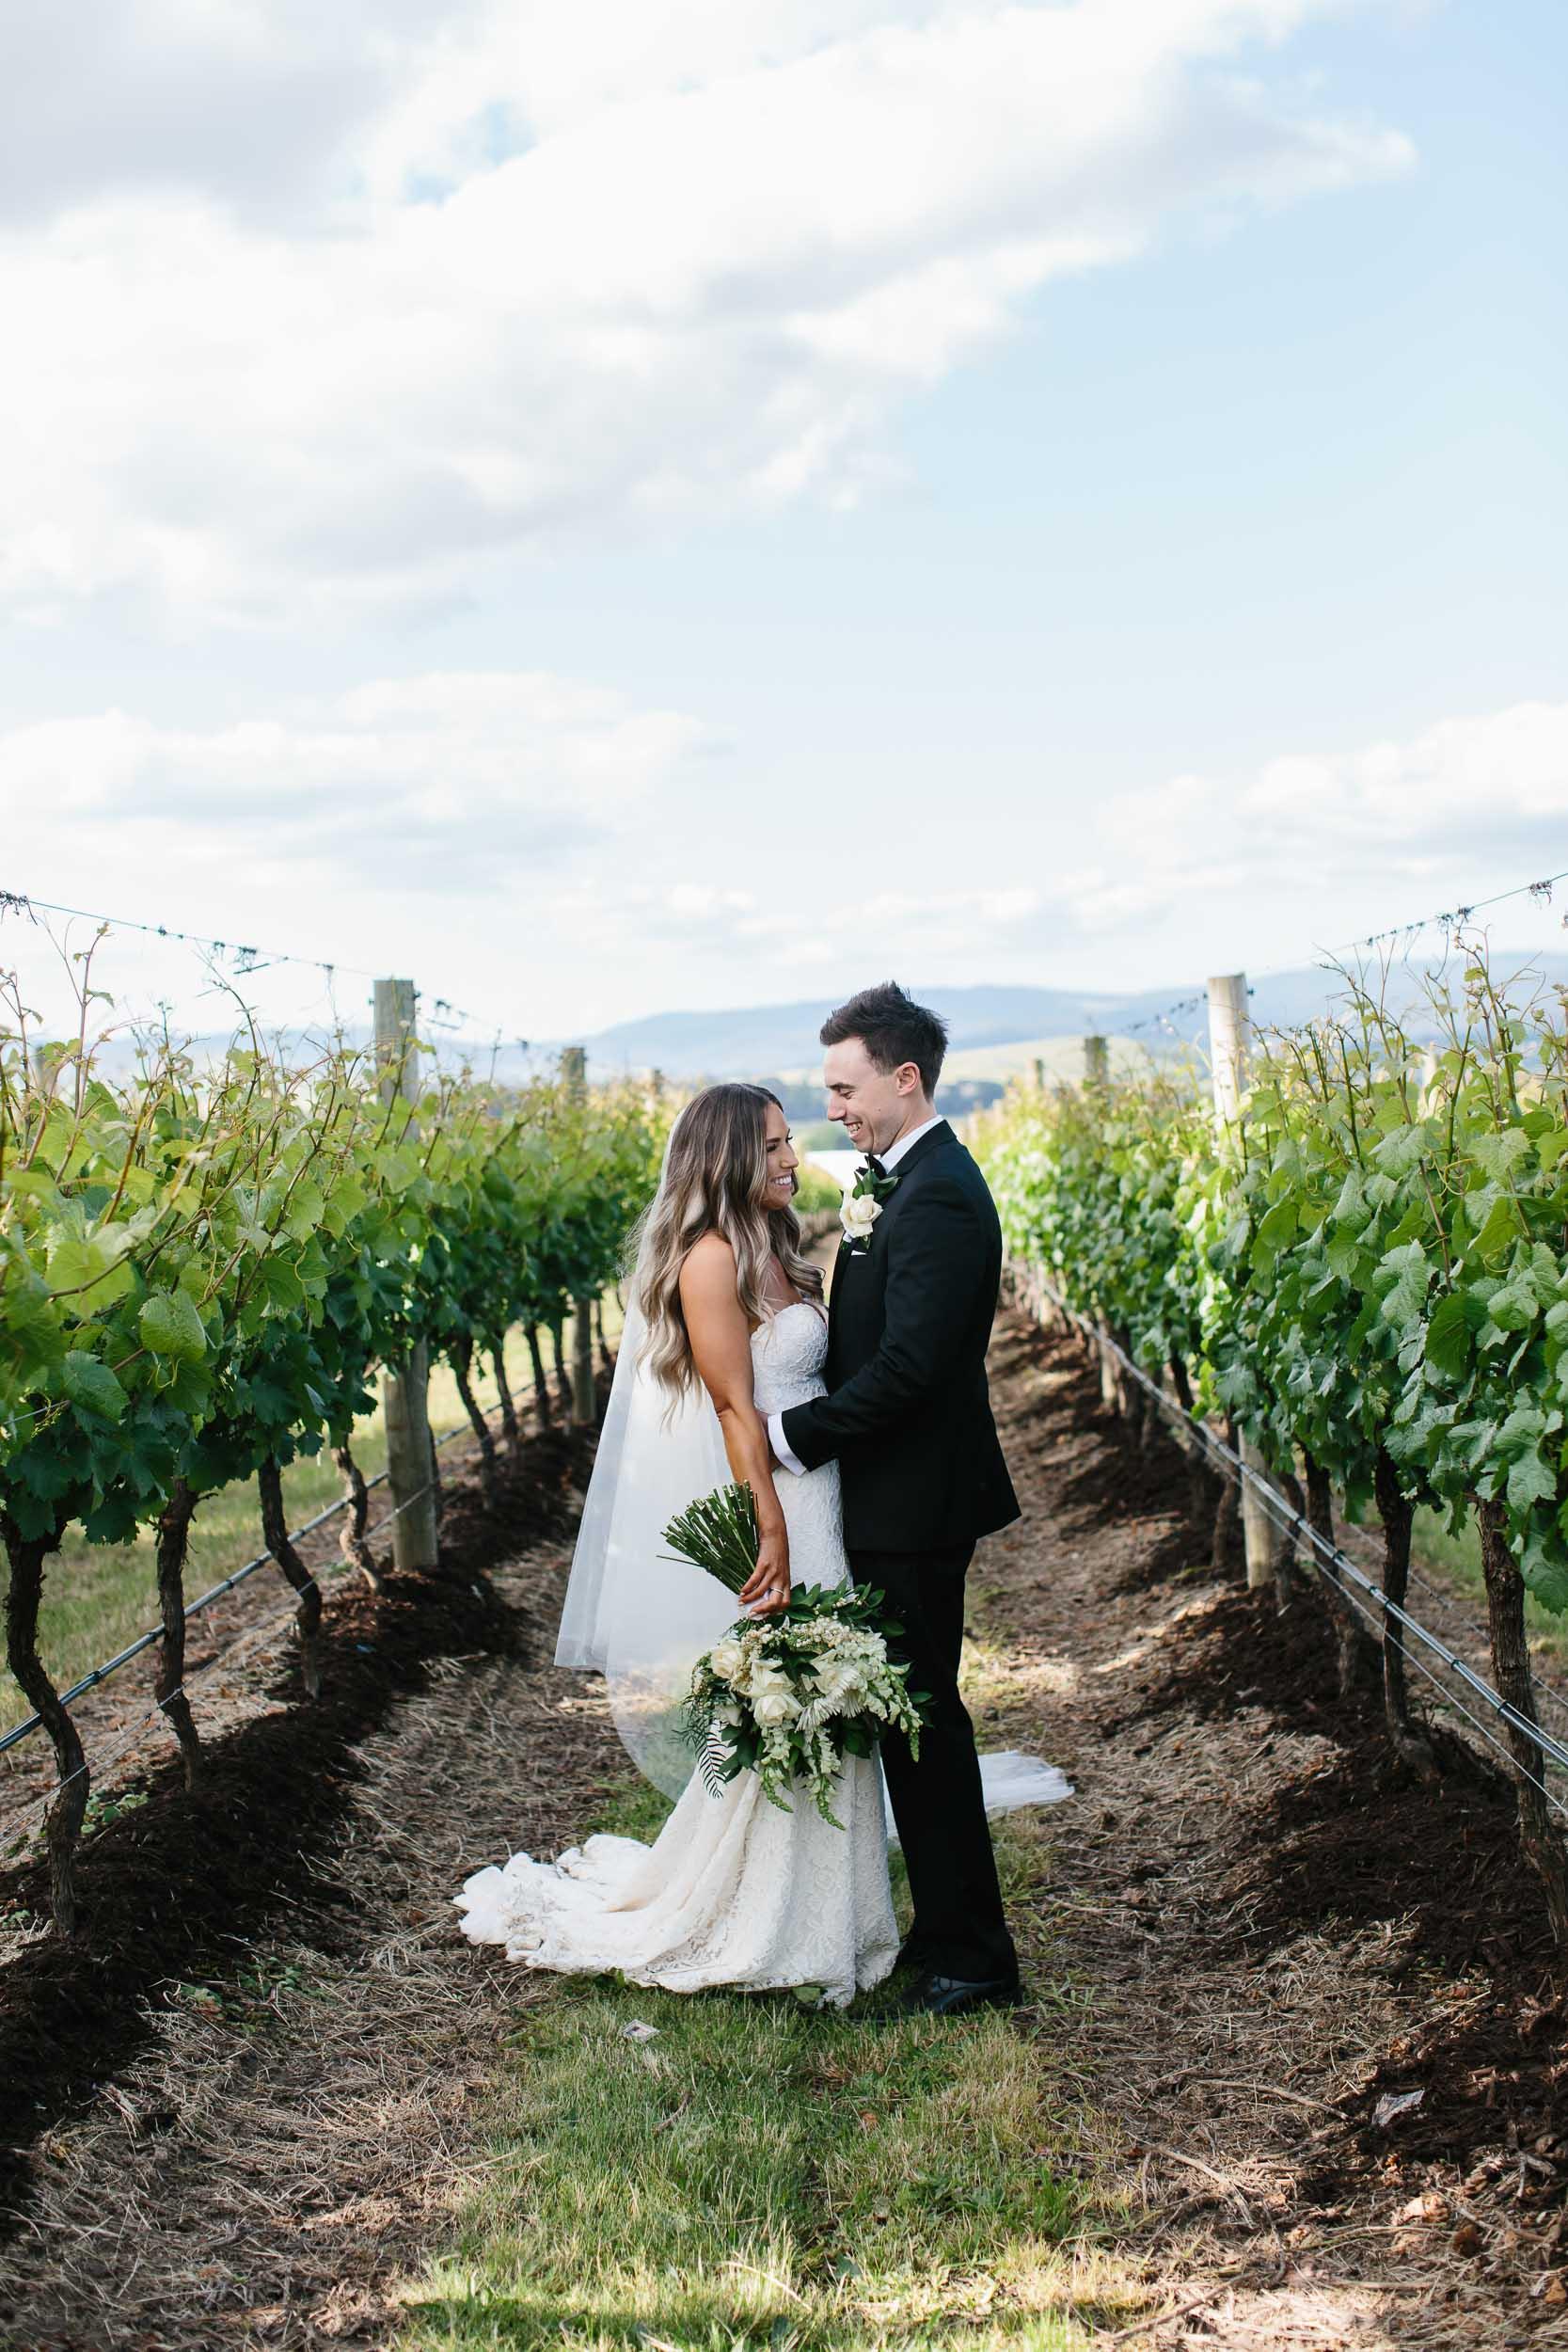 Kas-Richards-Stones-of-the-Yarra-Valley-Wedding-615.jpg